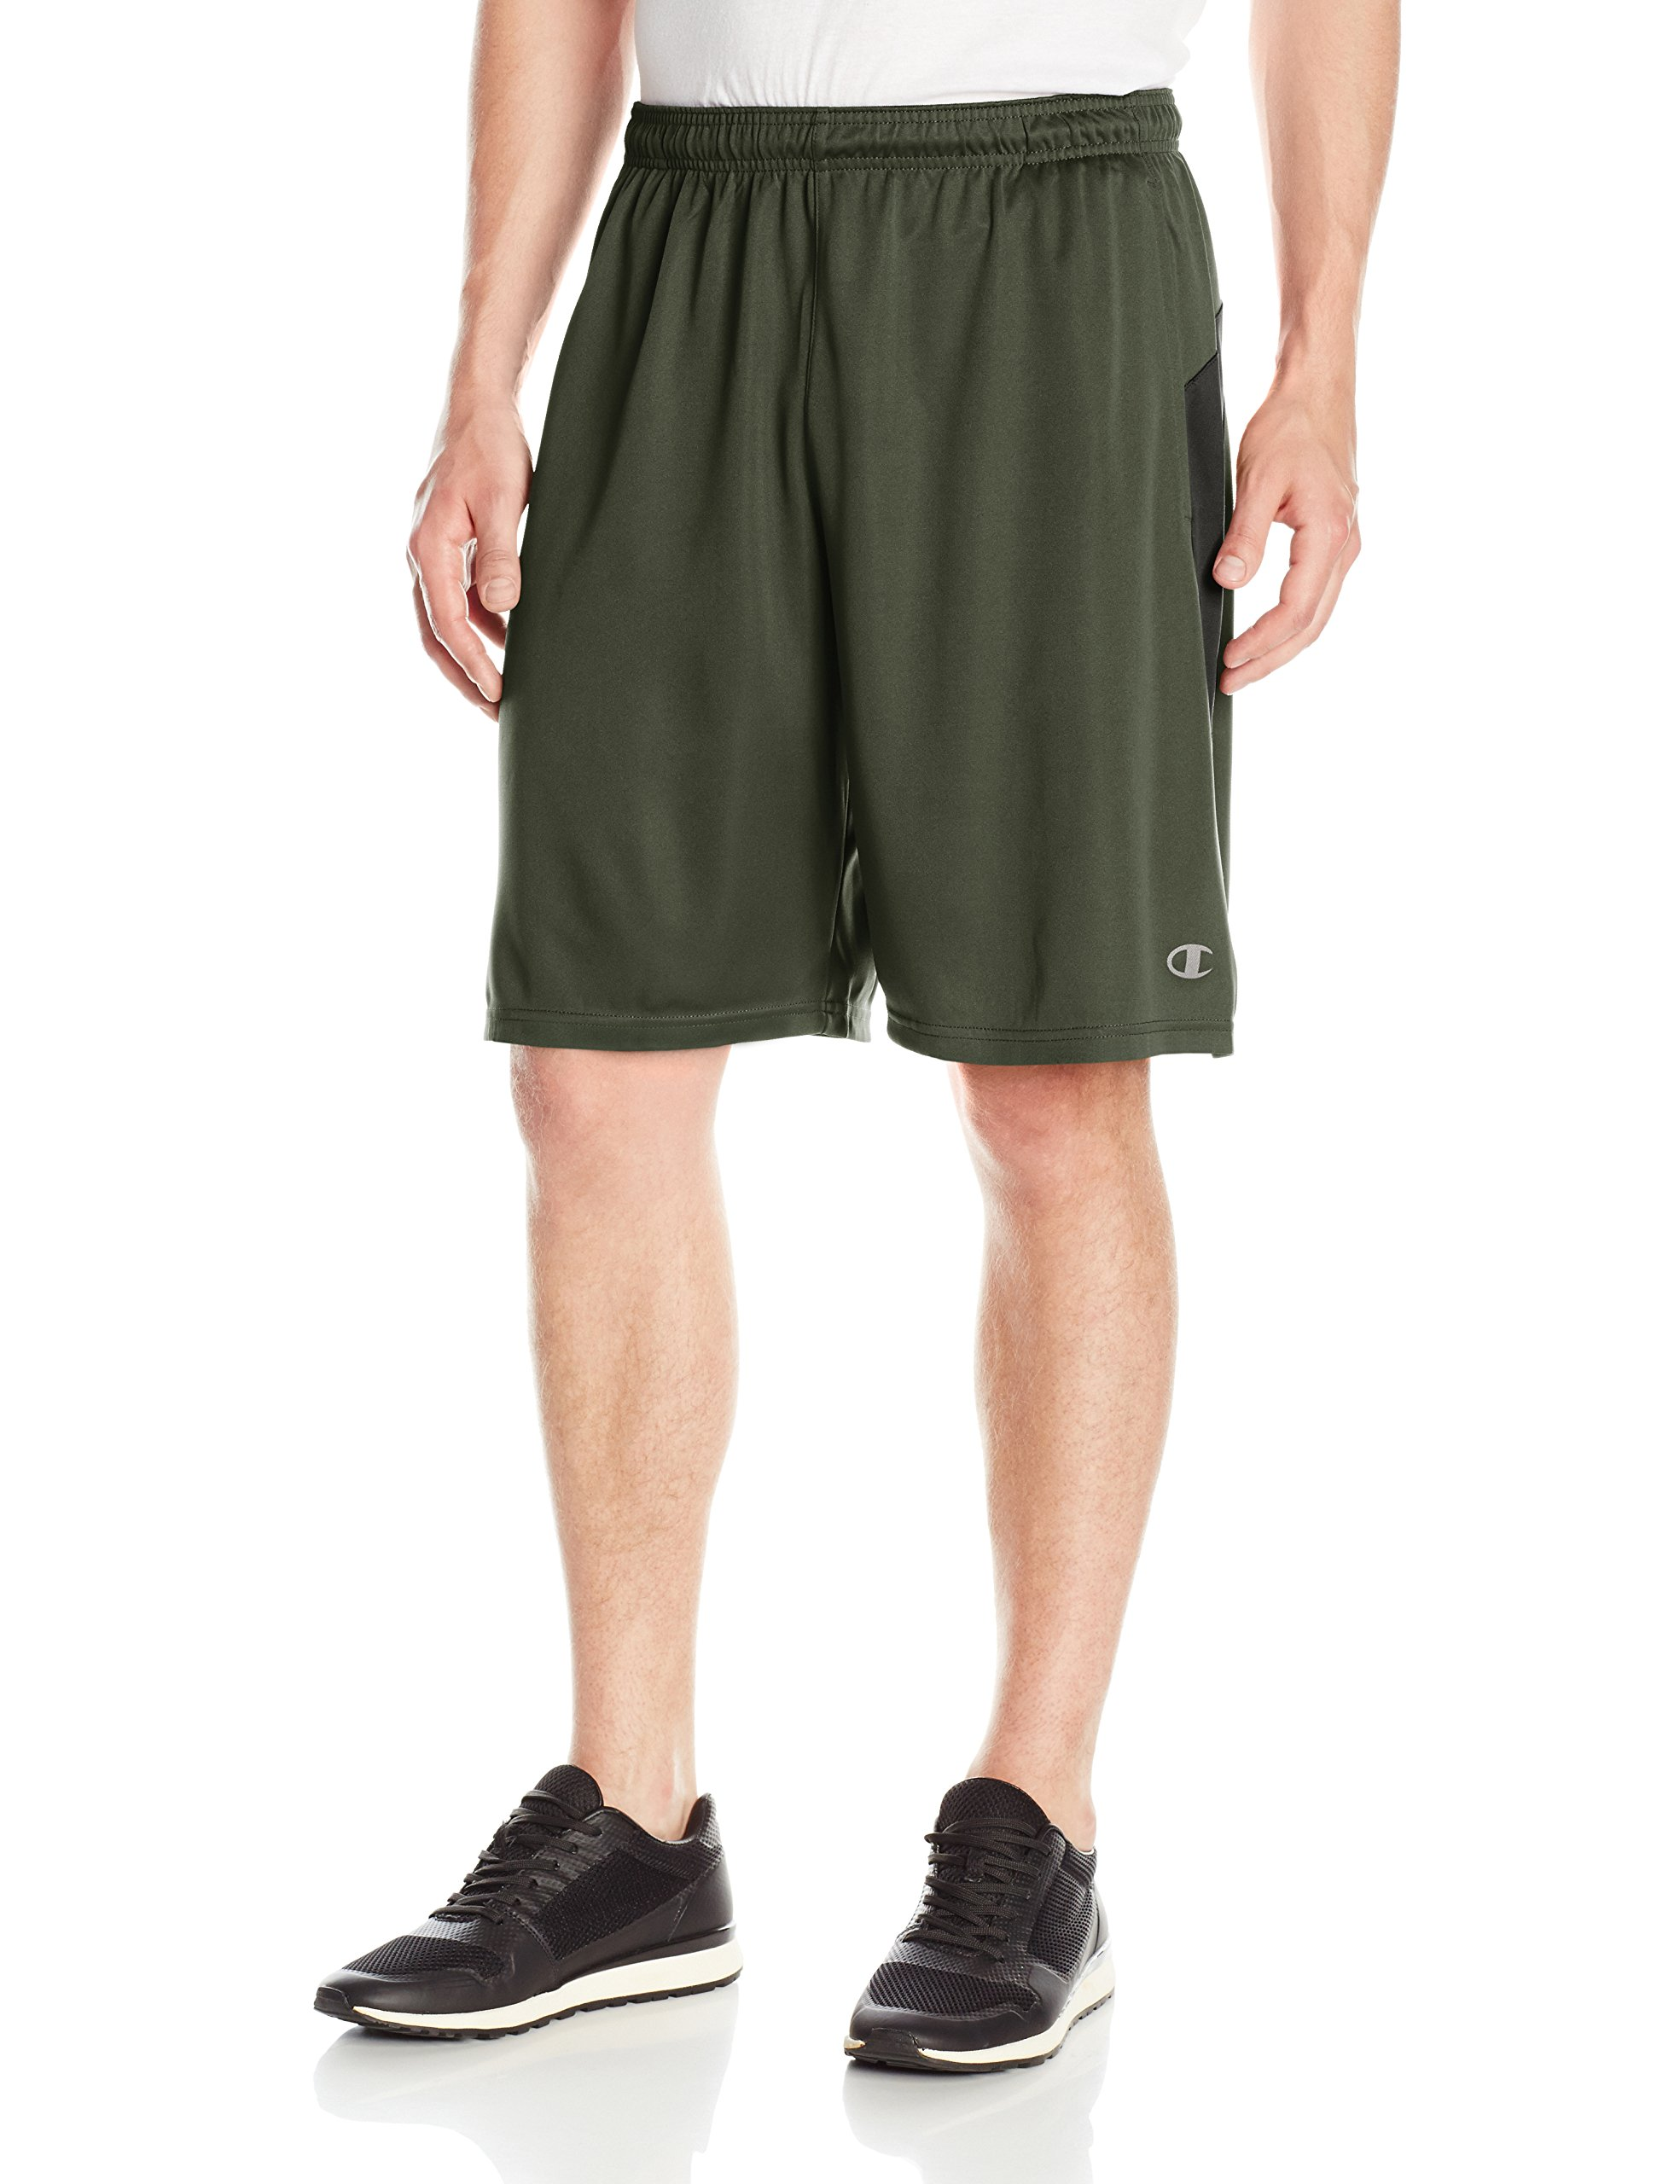 Champion Men's Double Dry Select Short, Forest Grove/Black, L